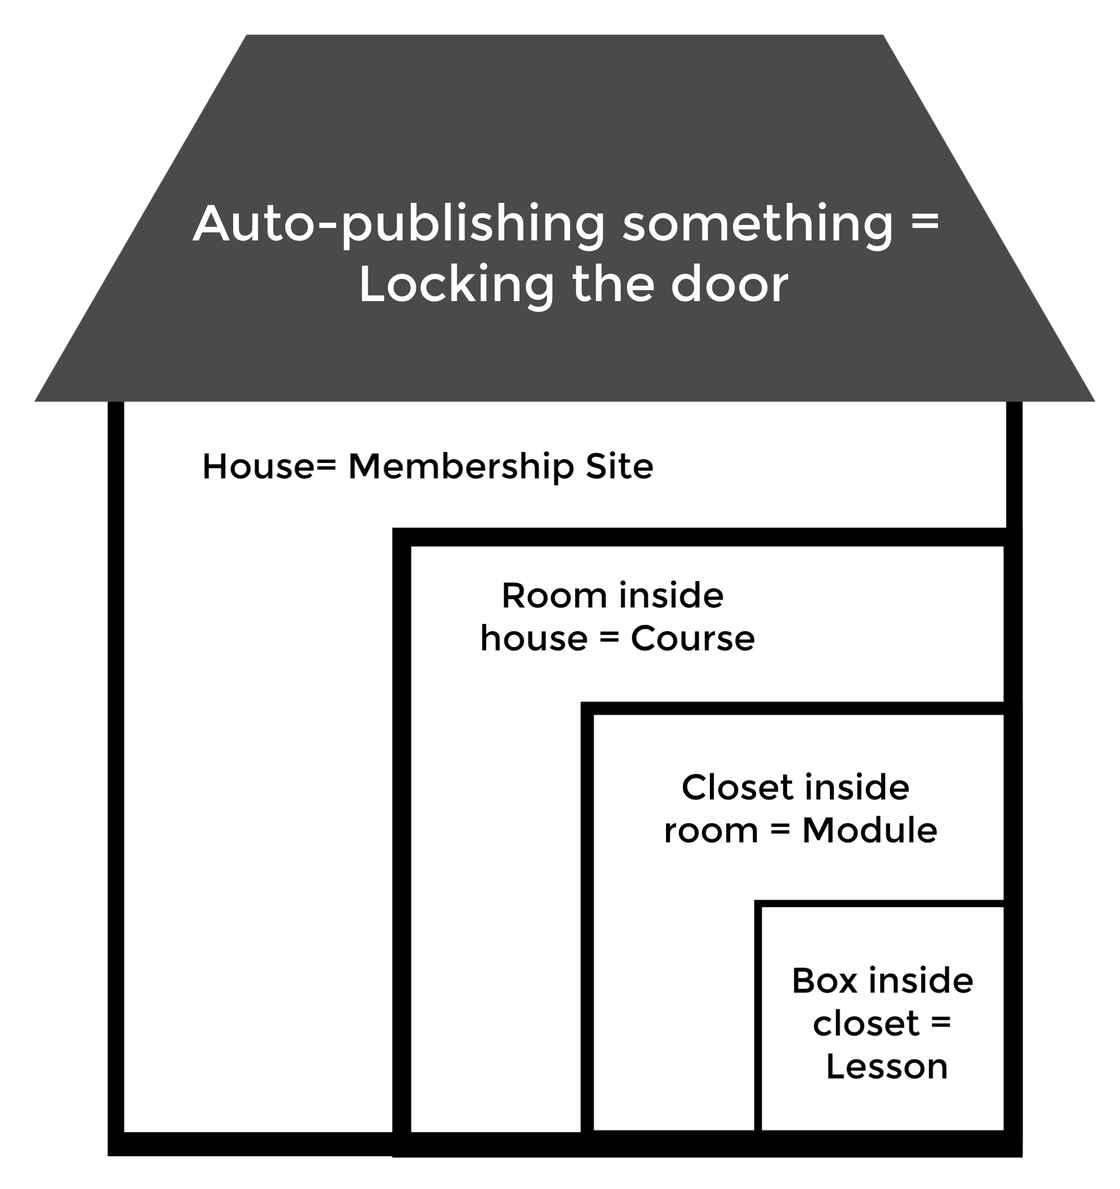 Auto-publish house.jpg